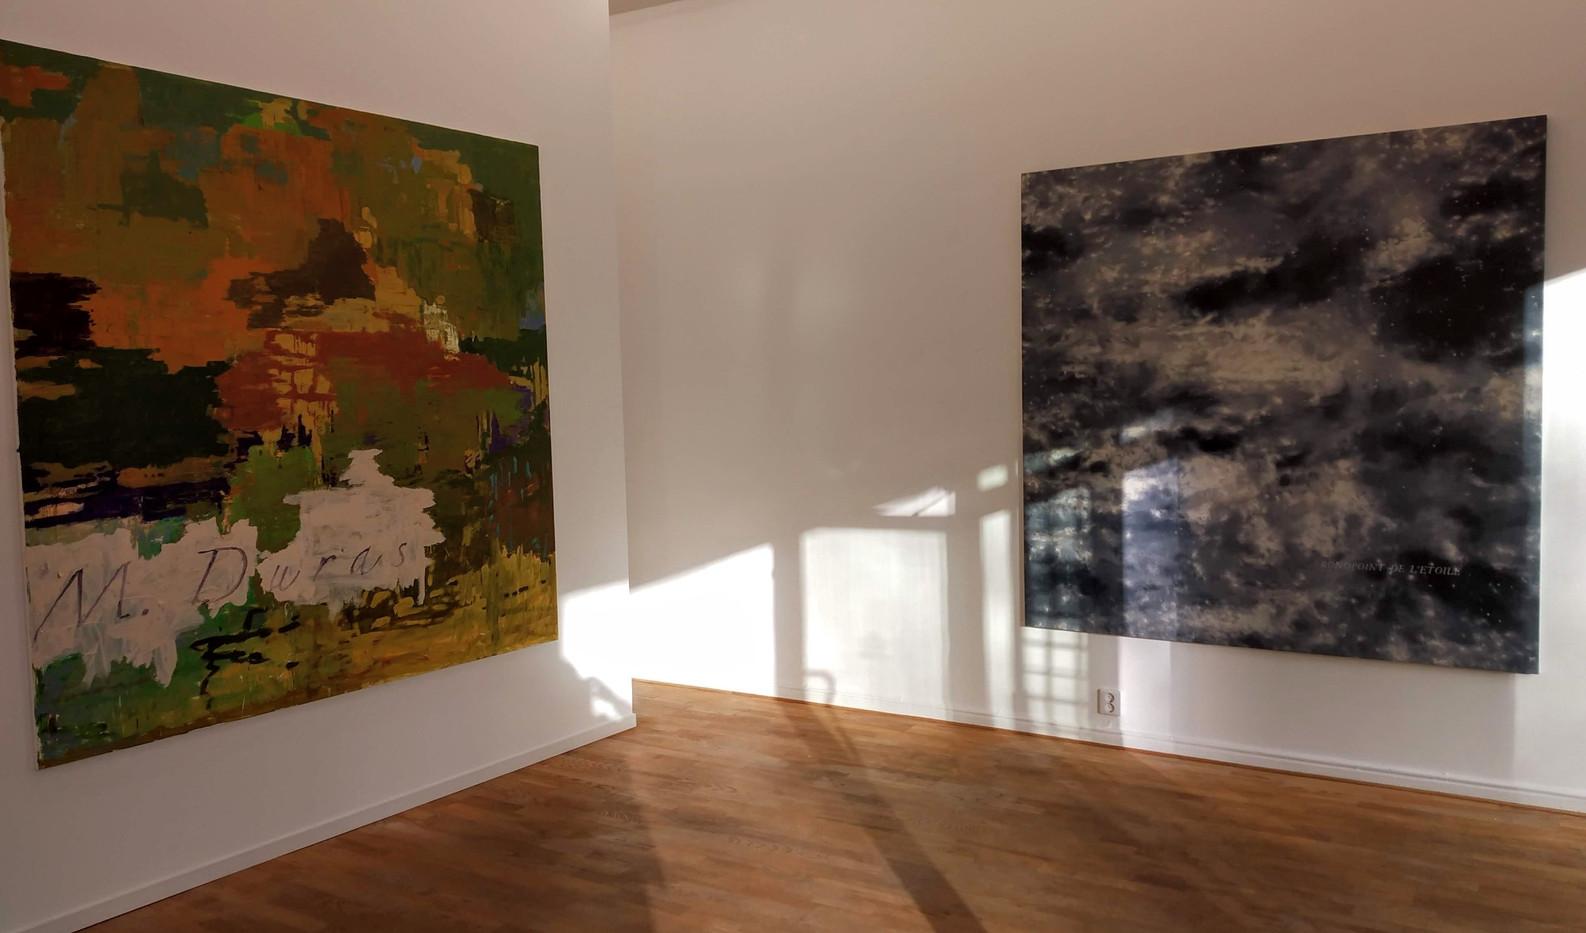 Paintings by Kehnet Nielsen and Ola Billgren